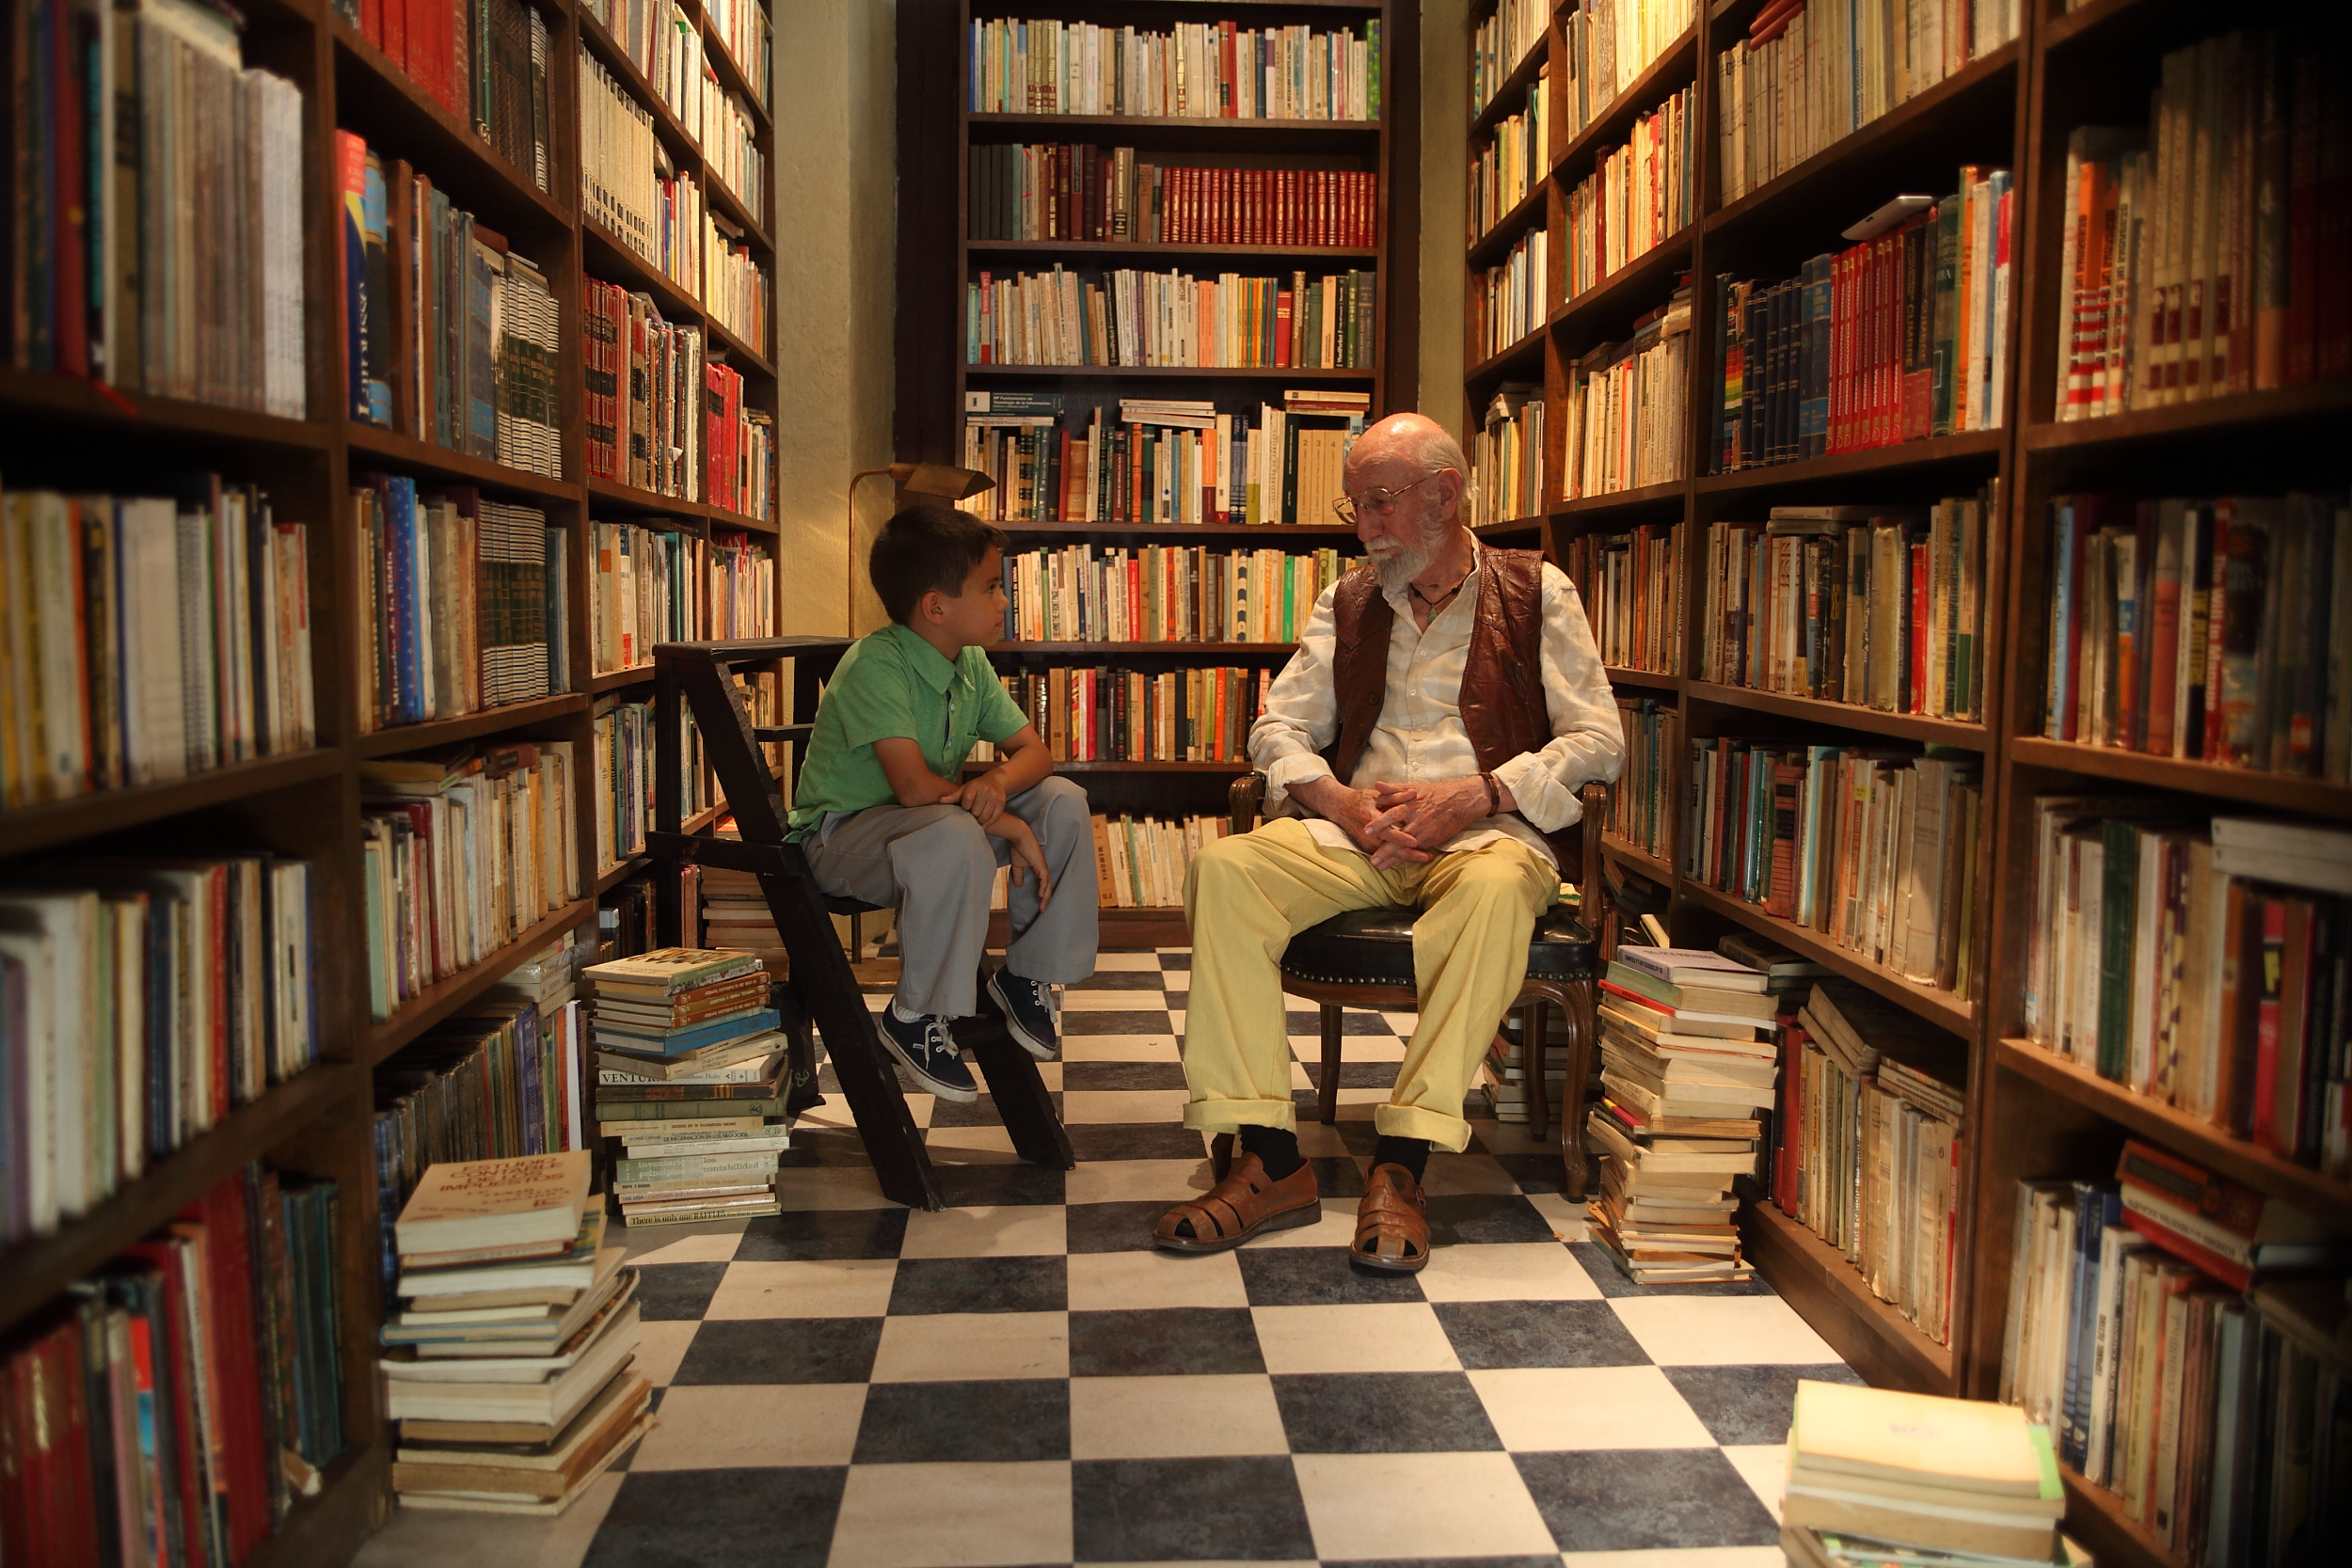 Jeremías conversa con su compañero de ajedrez, Don G. Foto: goldenglobes.com